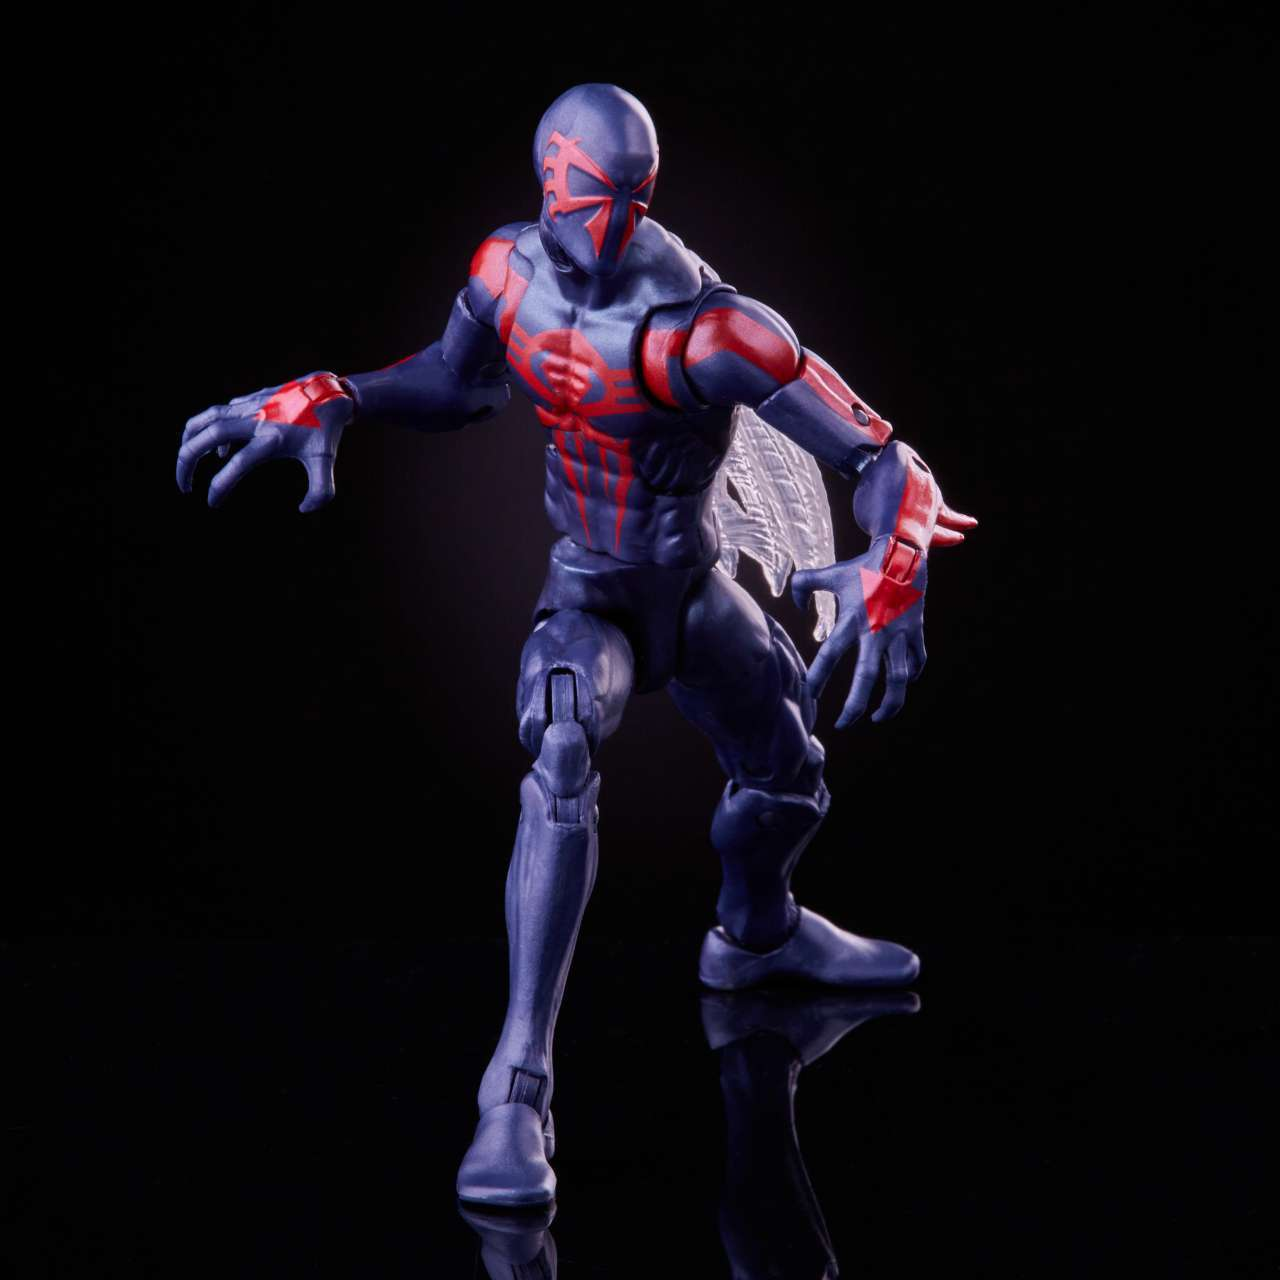 MARVEL LEGENDS SERIES 6-INCH SPIDER-MAN 2099 Figure - oop (3)